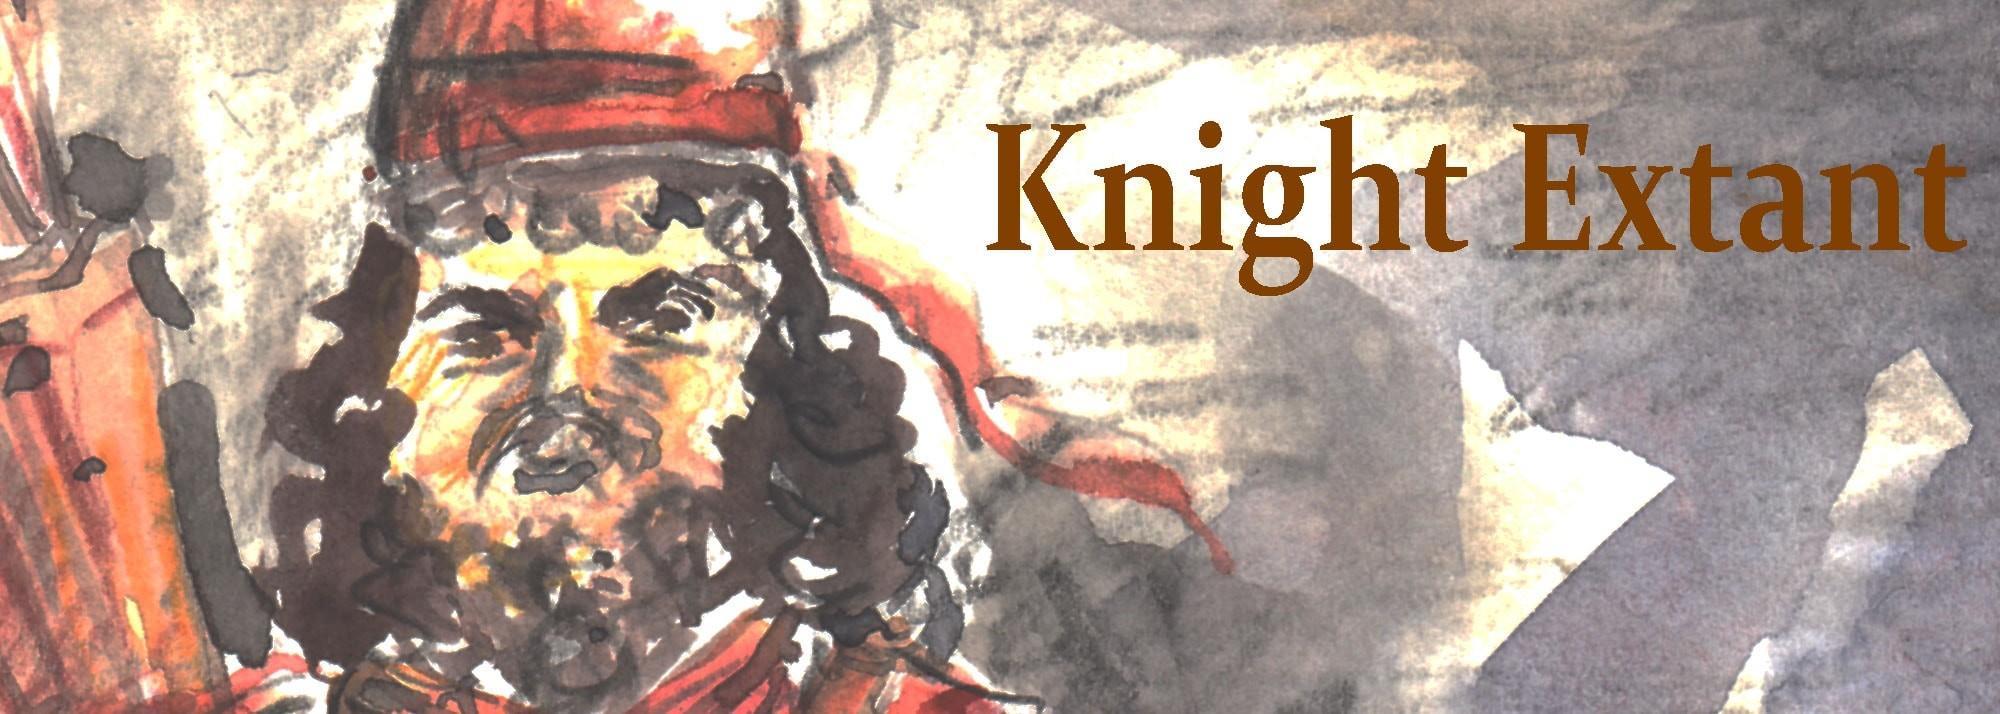 Knight Extant